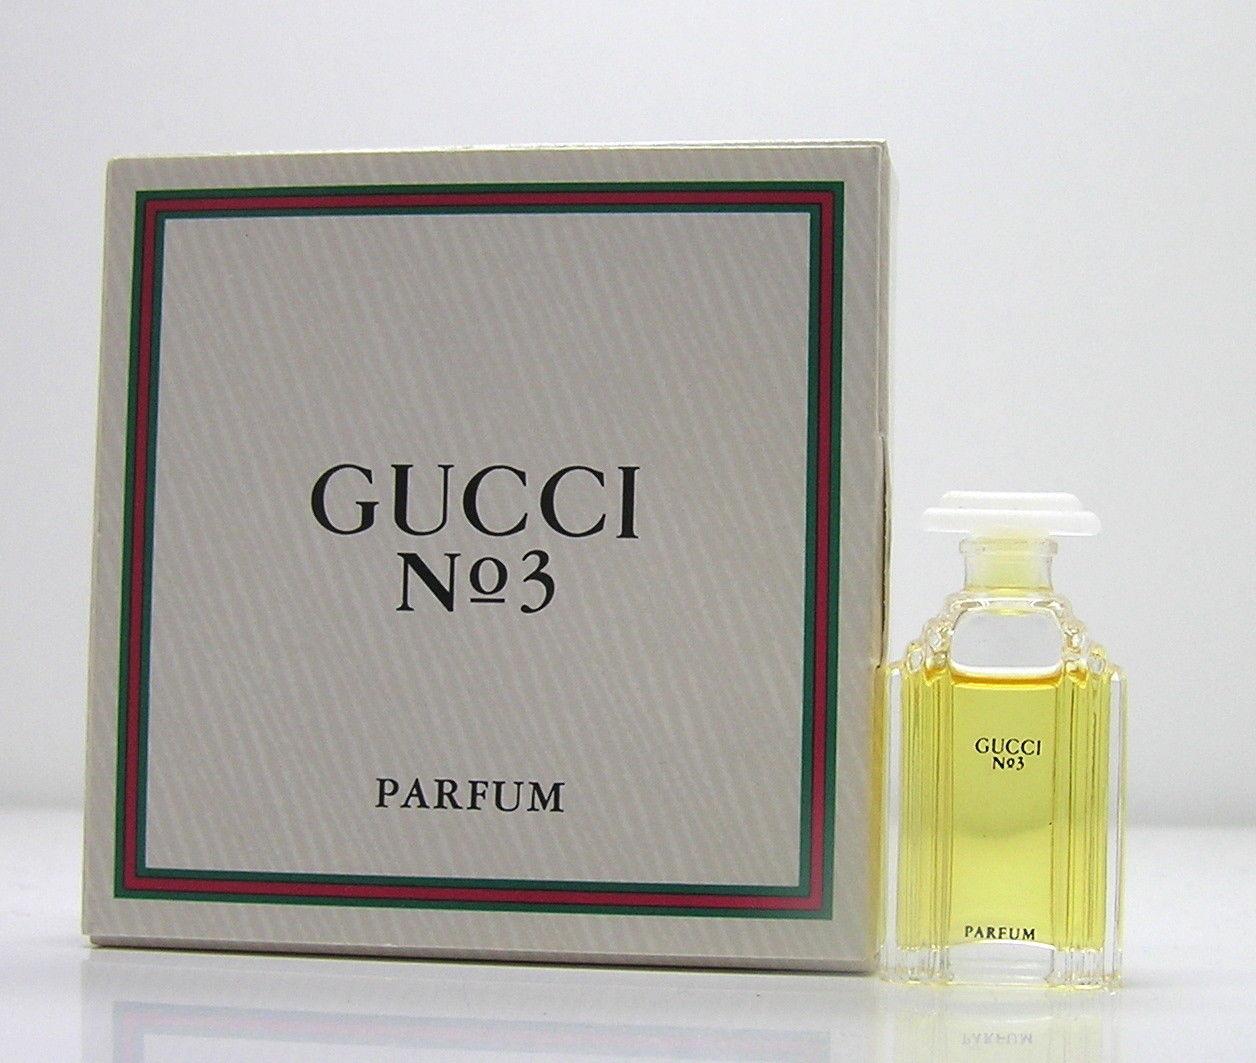 Gucci No. 3 Parfum 3 ml